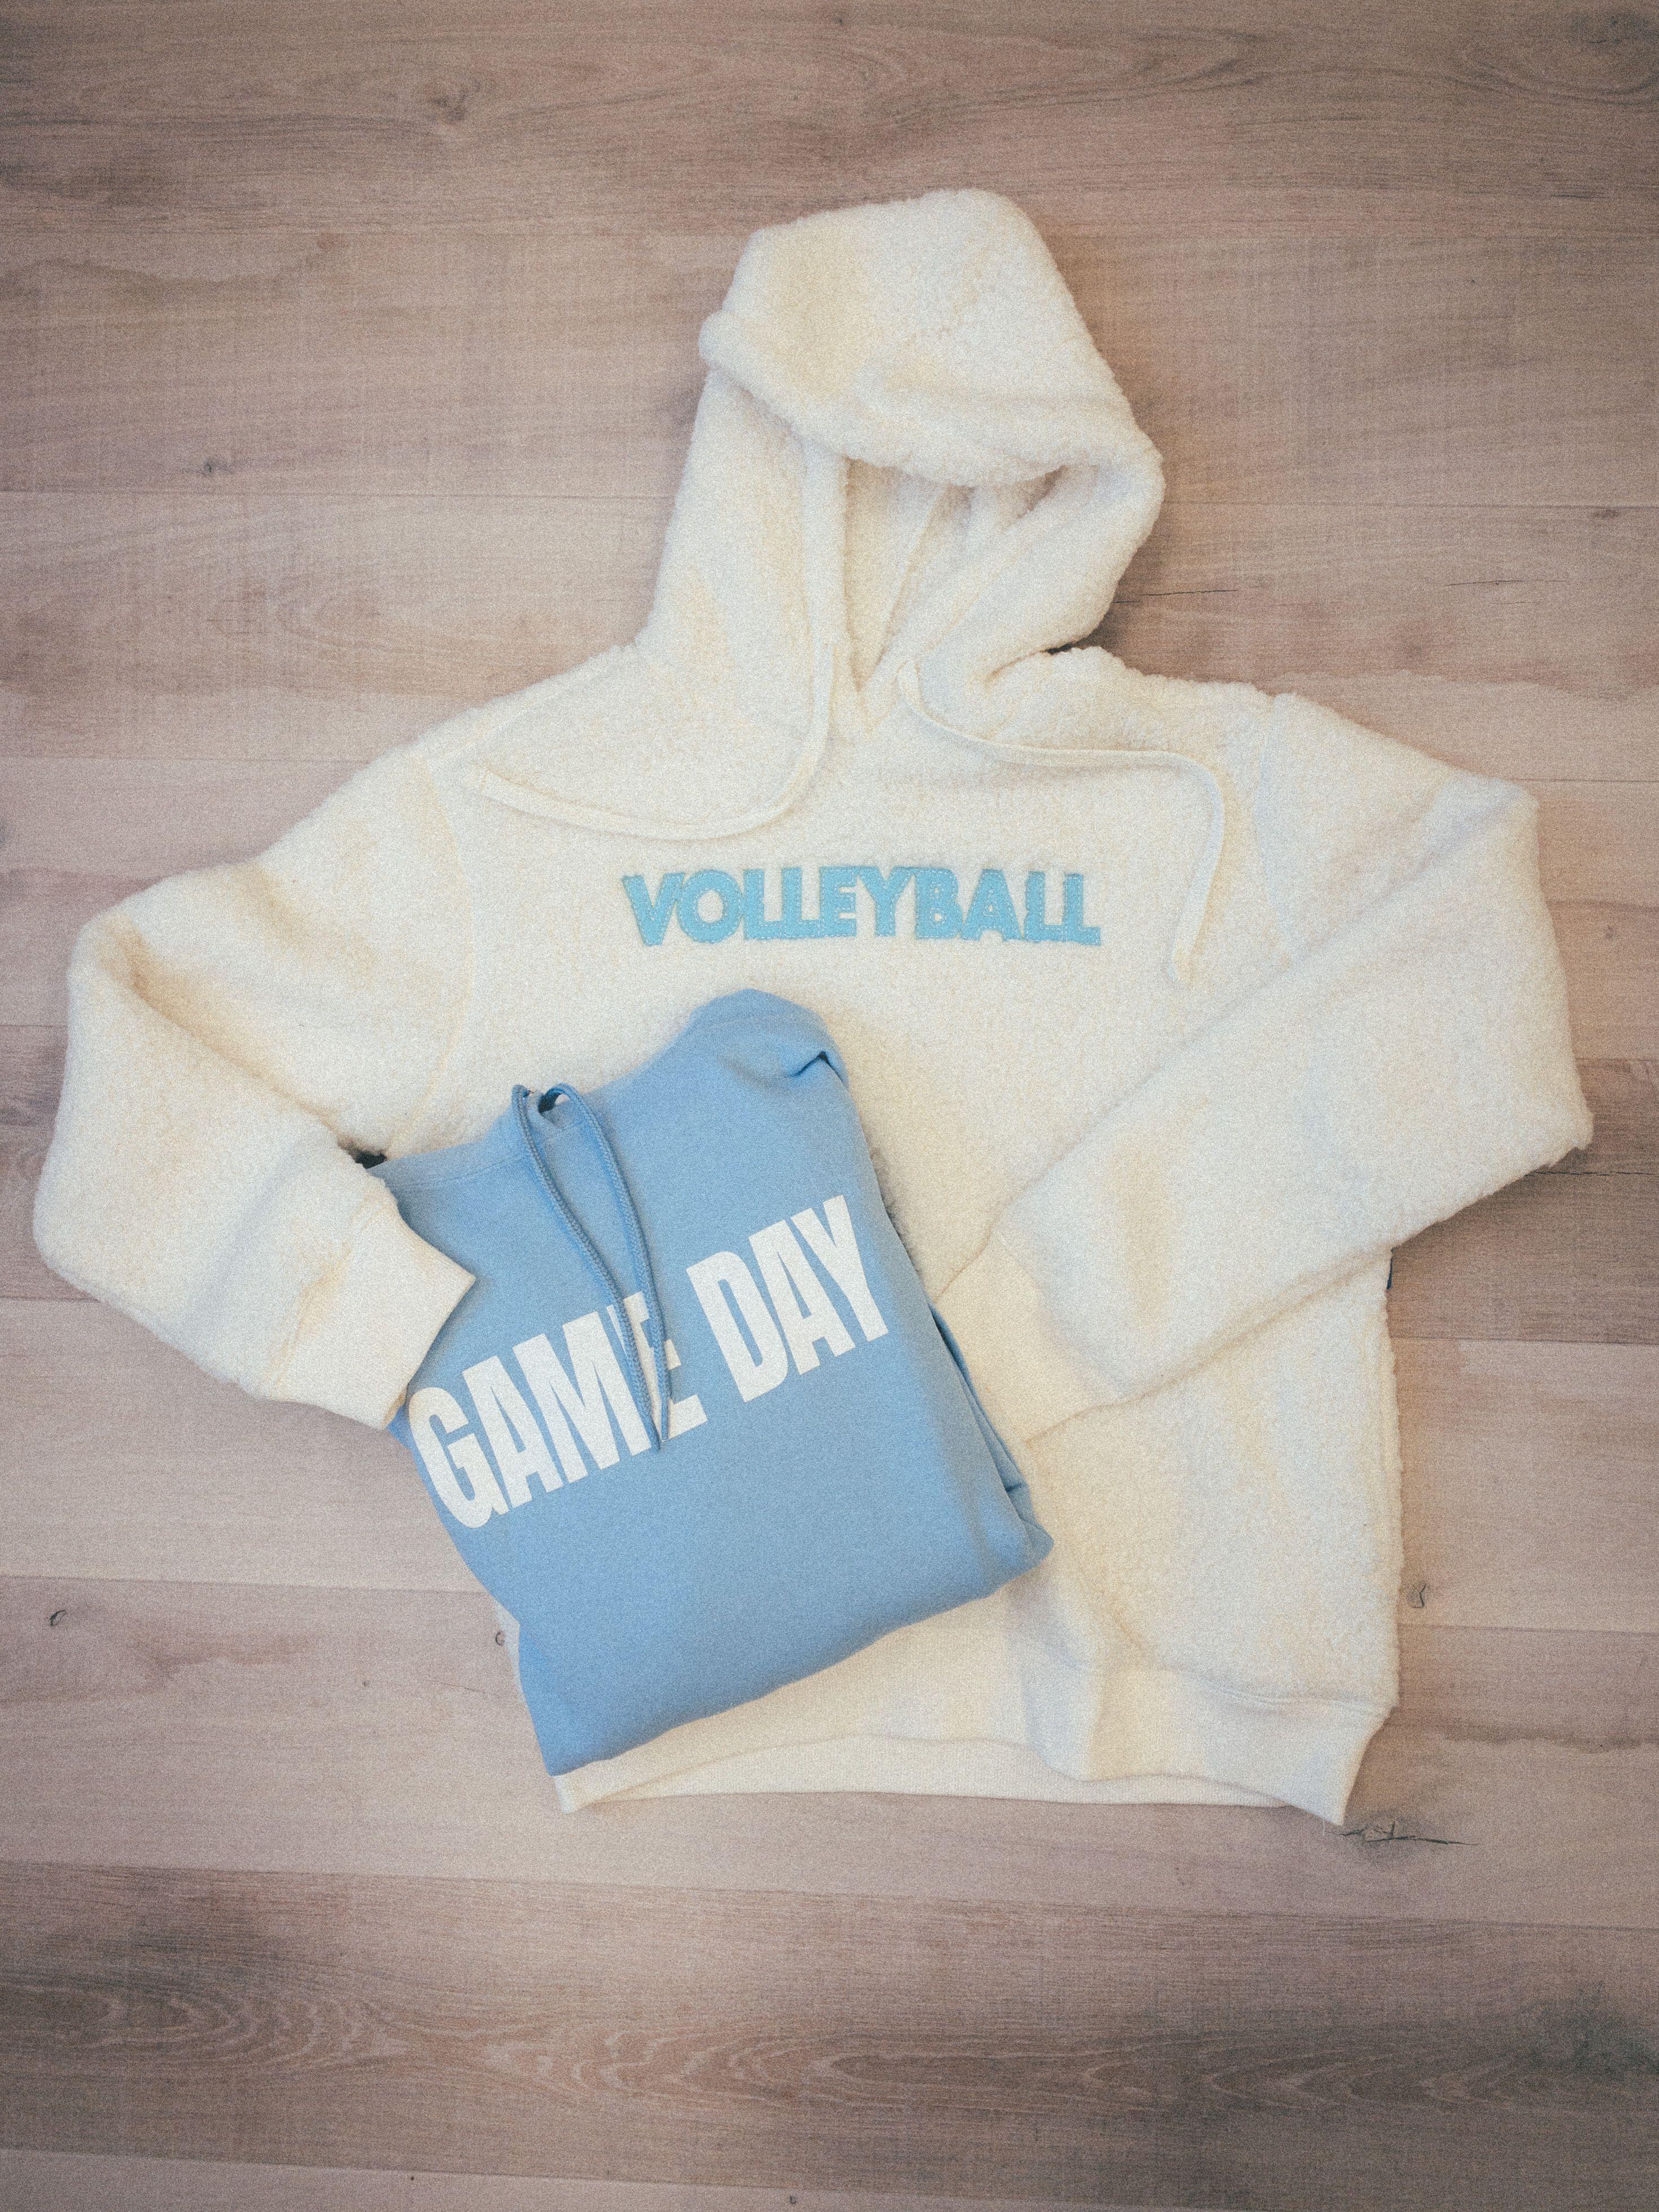 Volleyball Hoodies In 2020 Comfortable Hoodies Custom Hoodies Women Volleyball